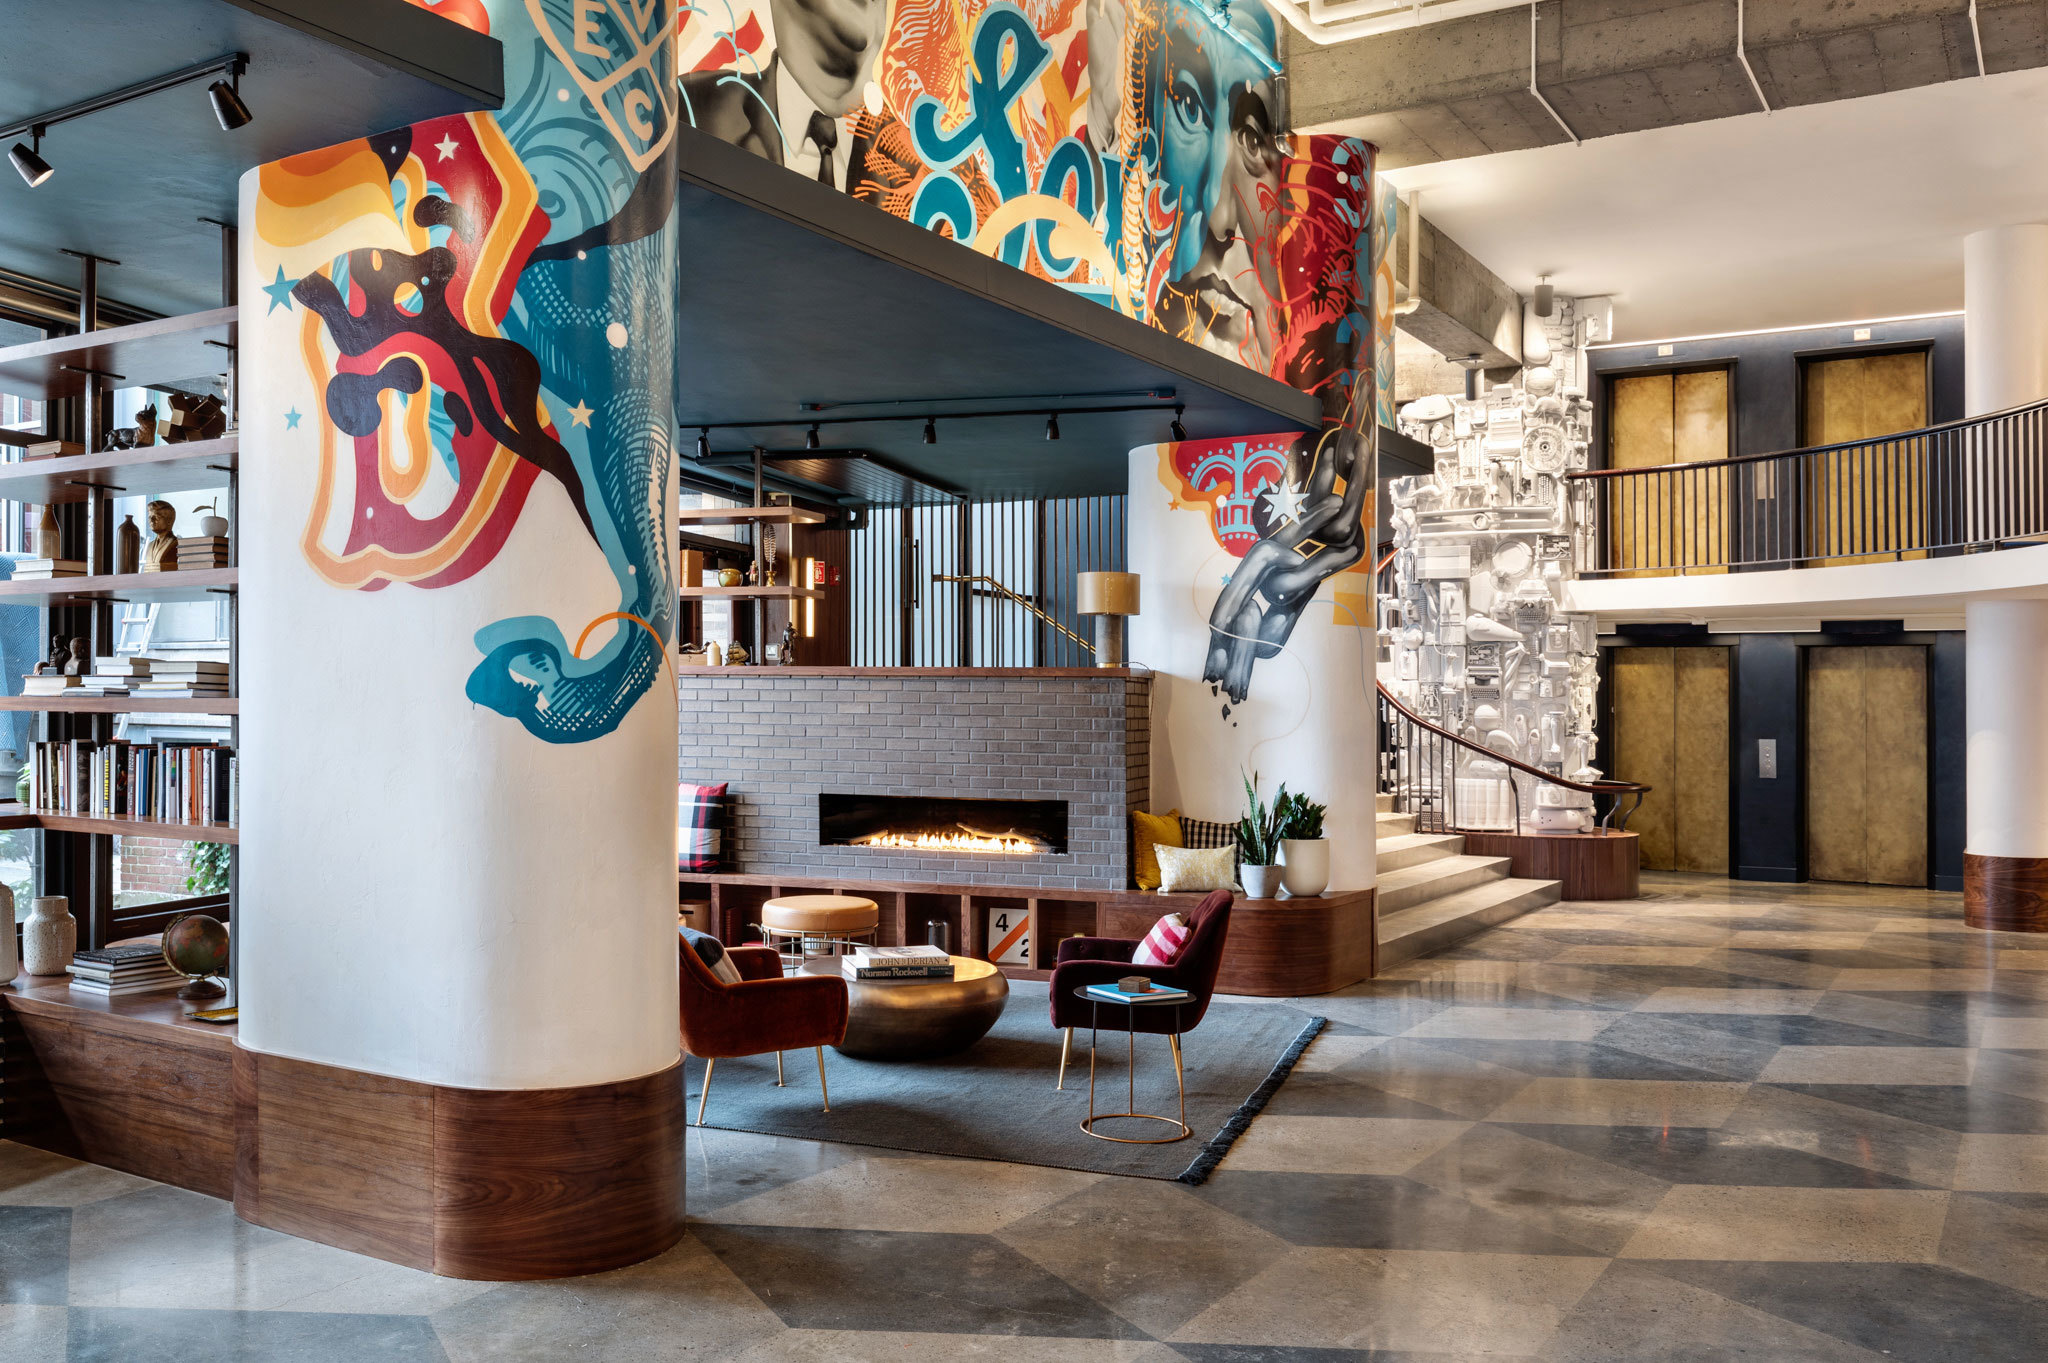 Hotel-We-Love-Revolution-Hotel.jpg?mtime=20190305181920#asset:105081